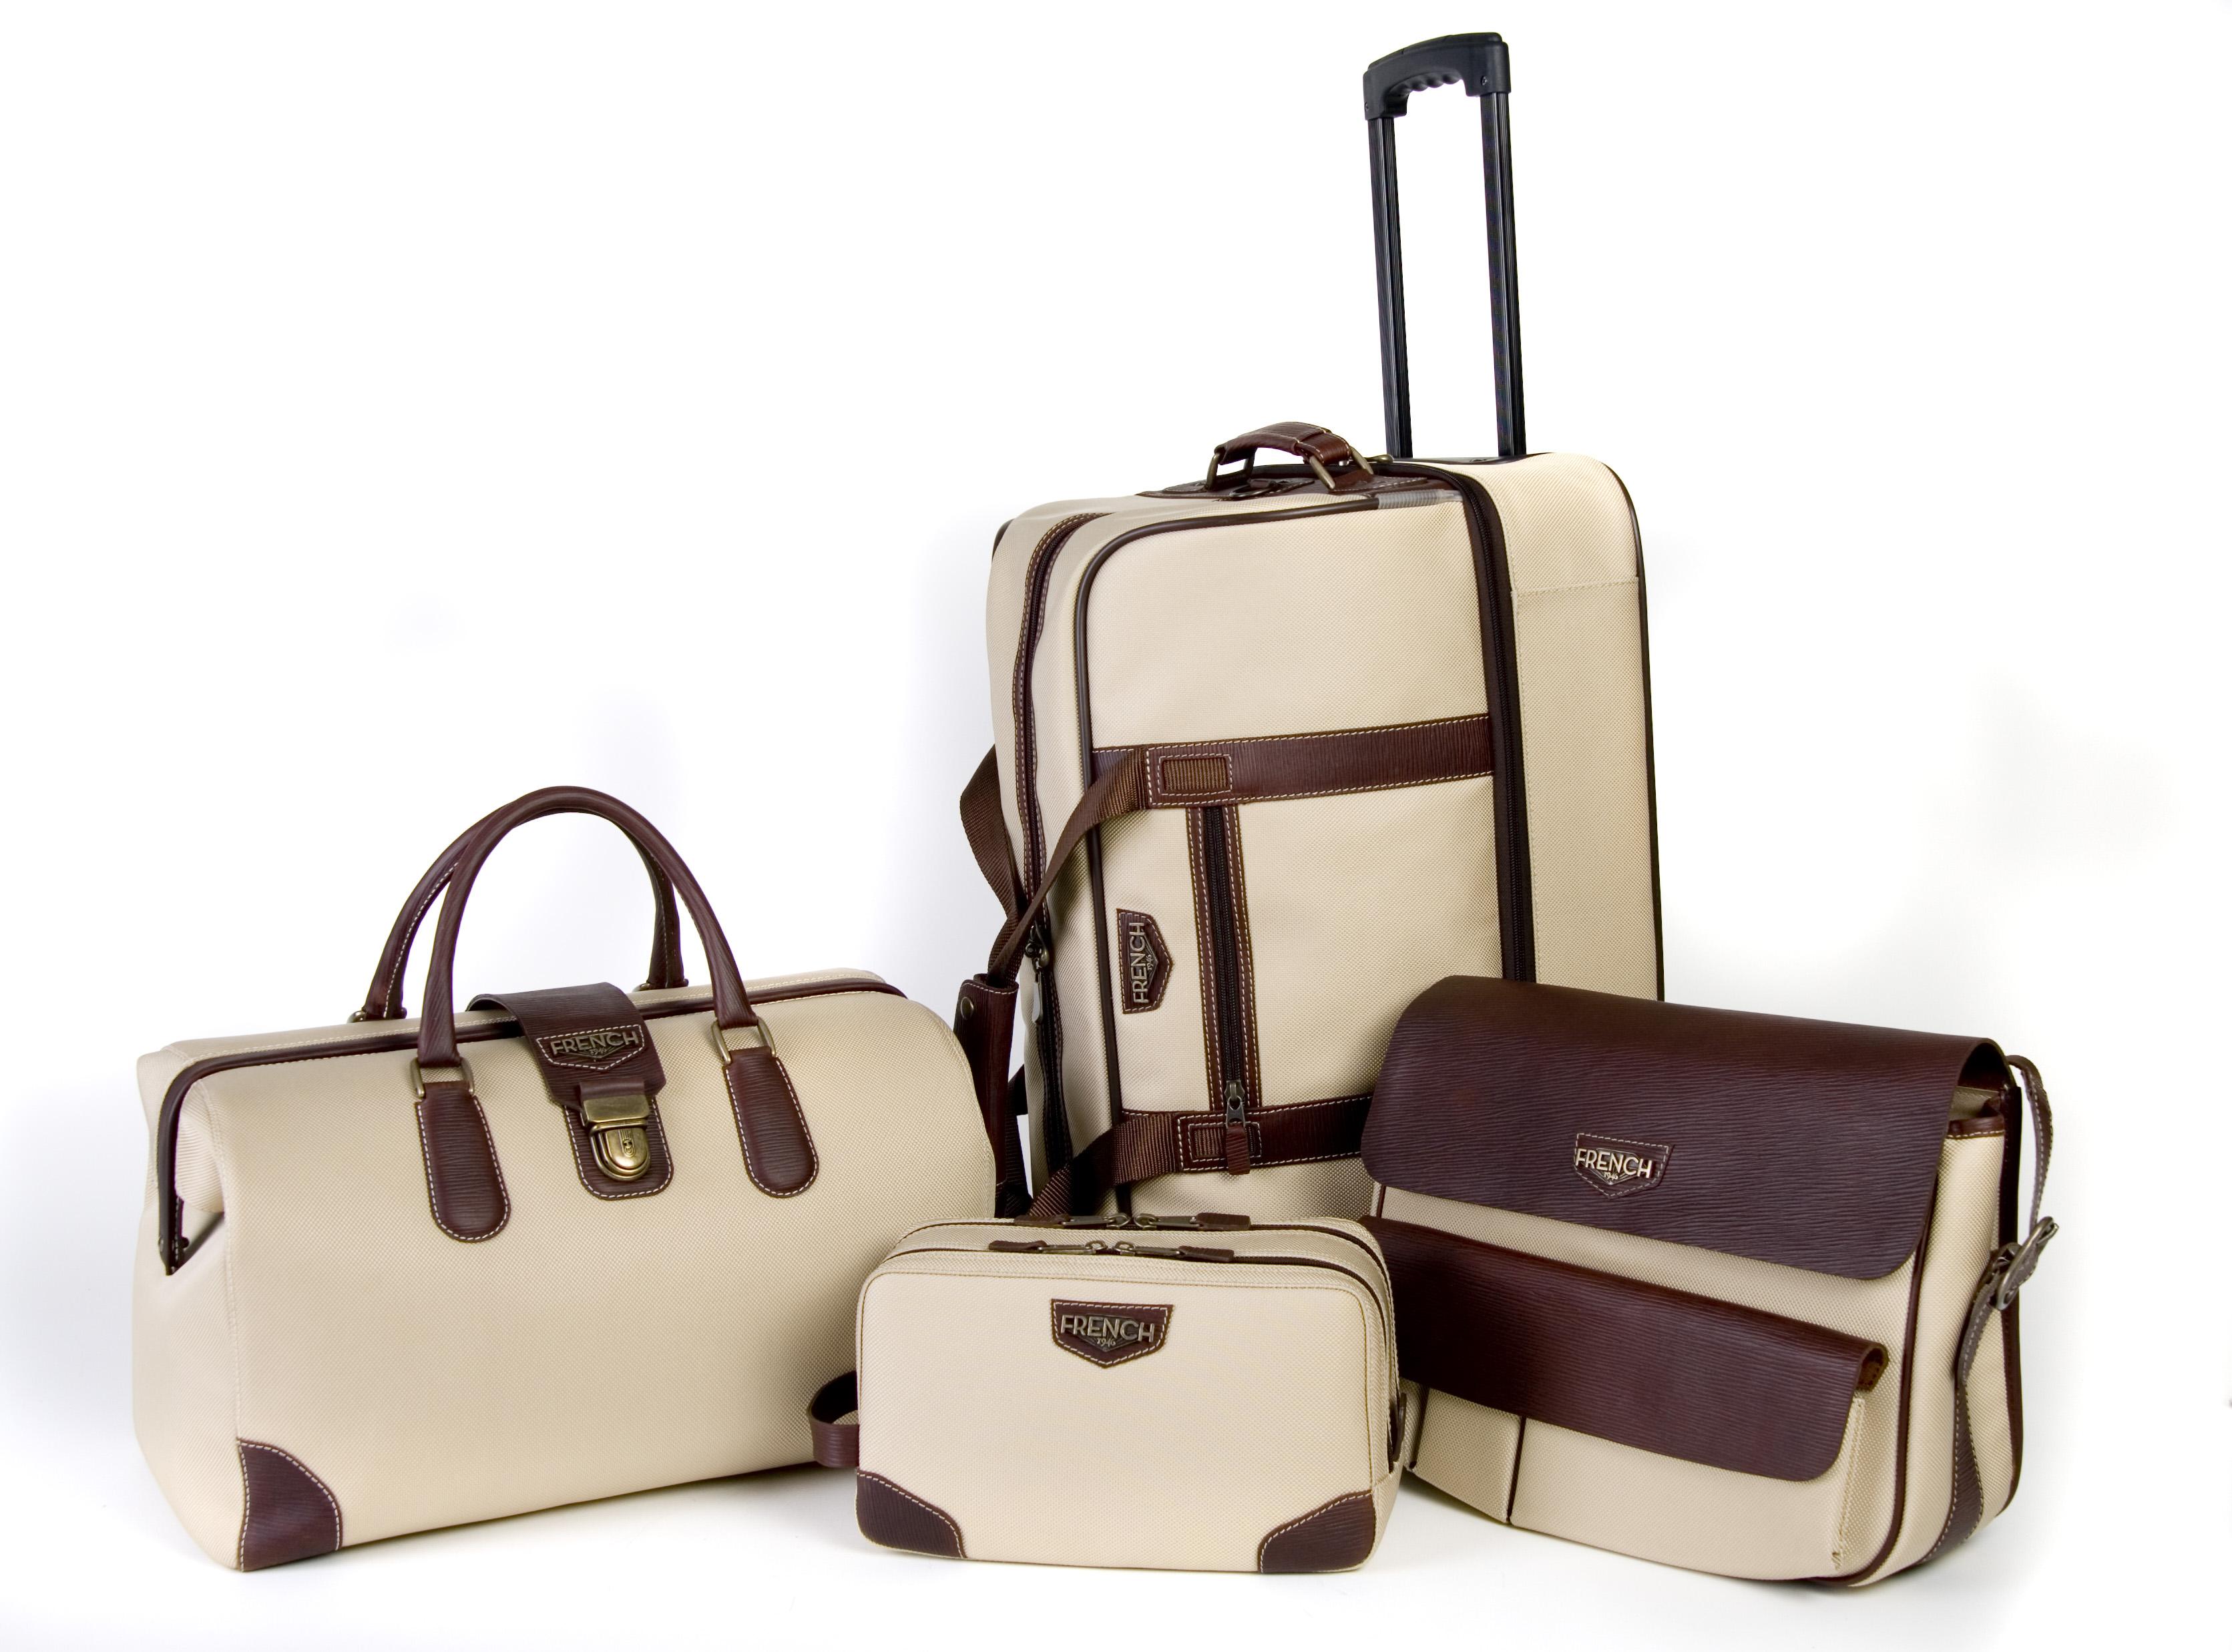 Neiman Marcus Travel Bags  873b6196f39ba